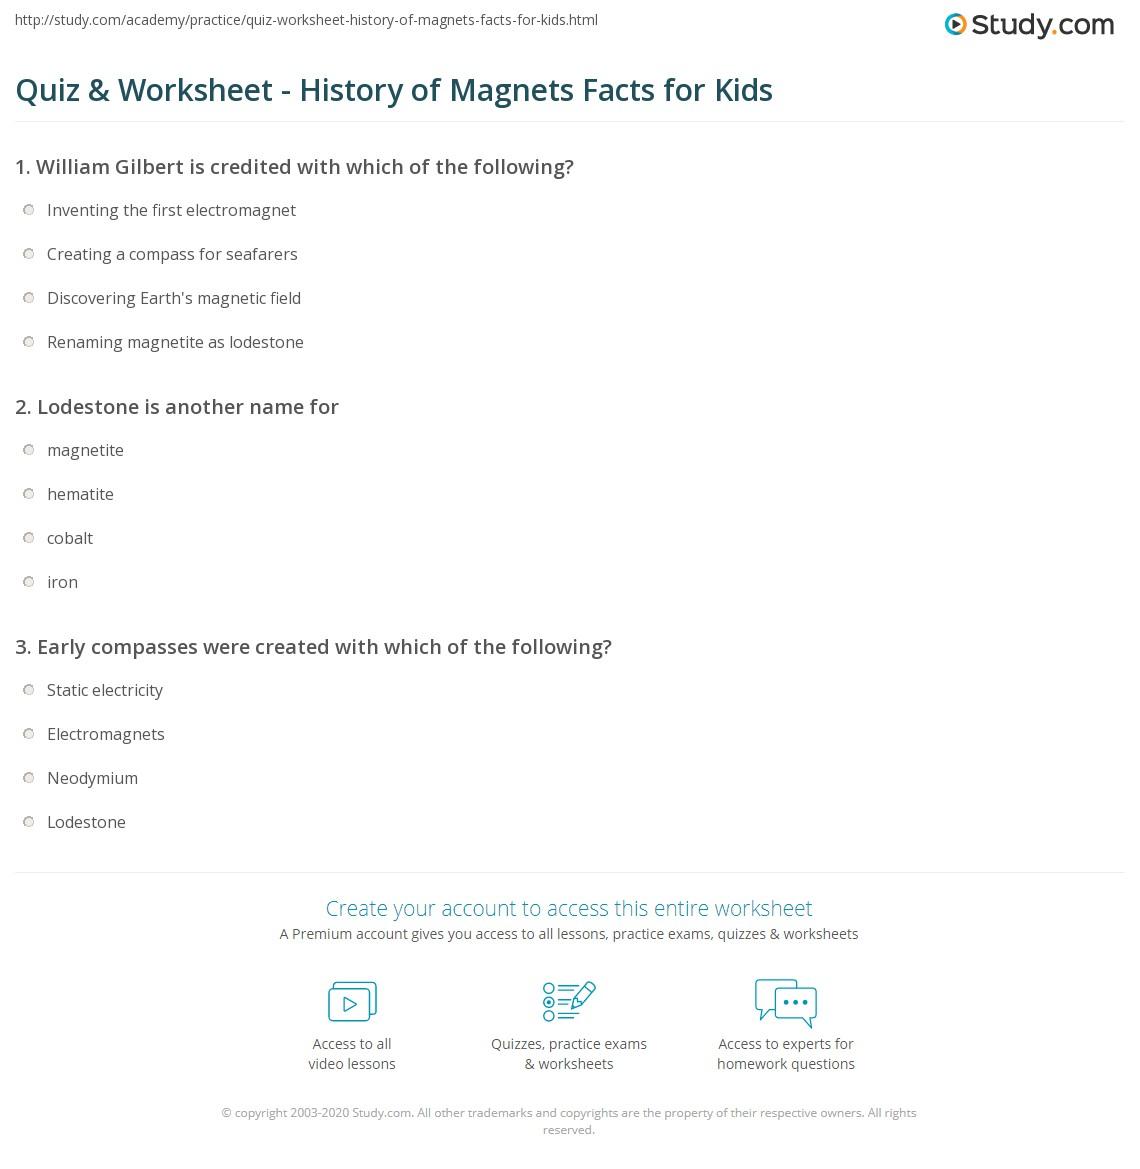 Quiz Worksheet History of Magnets Facts for Kids – Magnets Worksheets